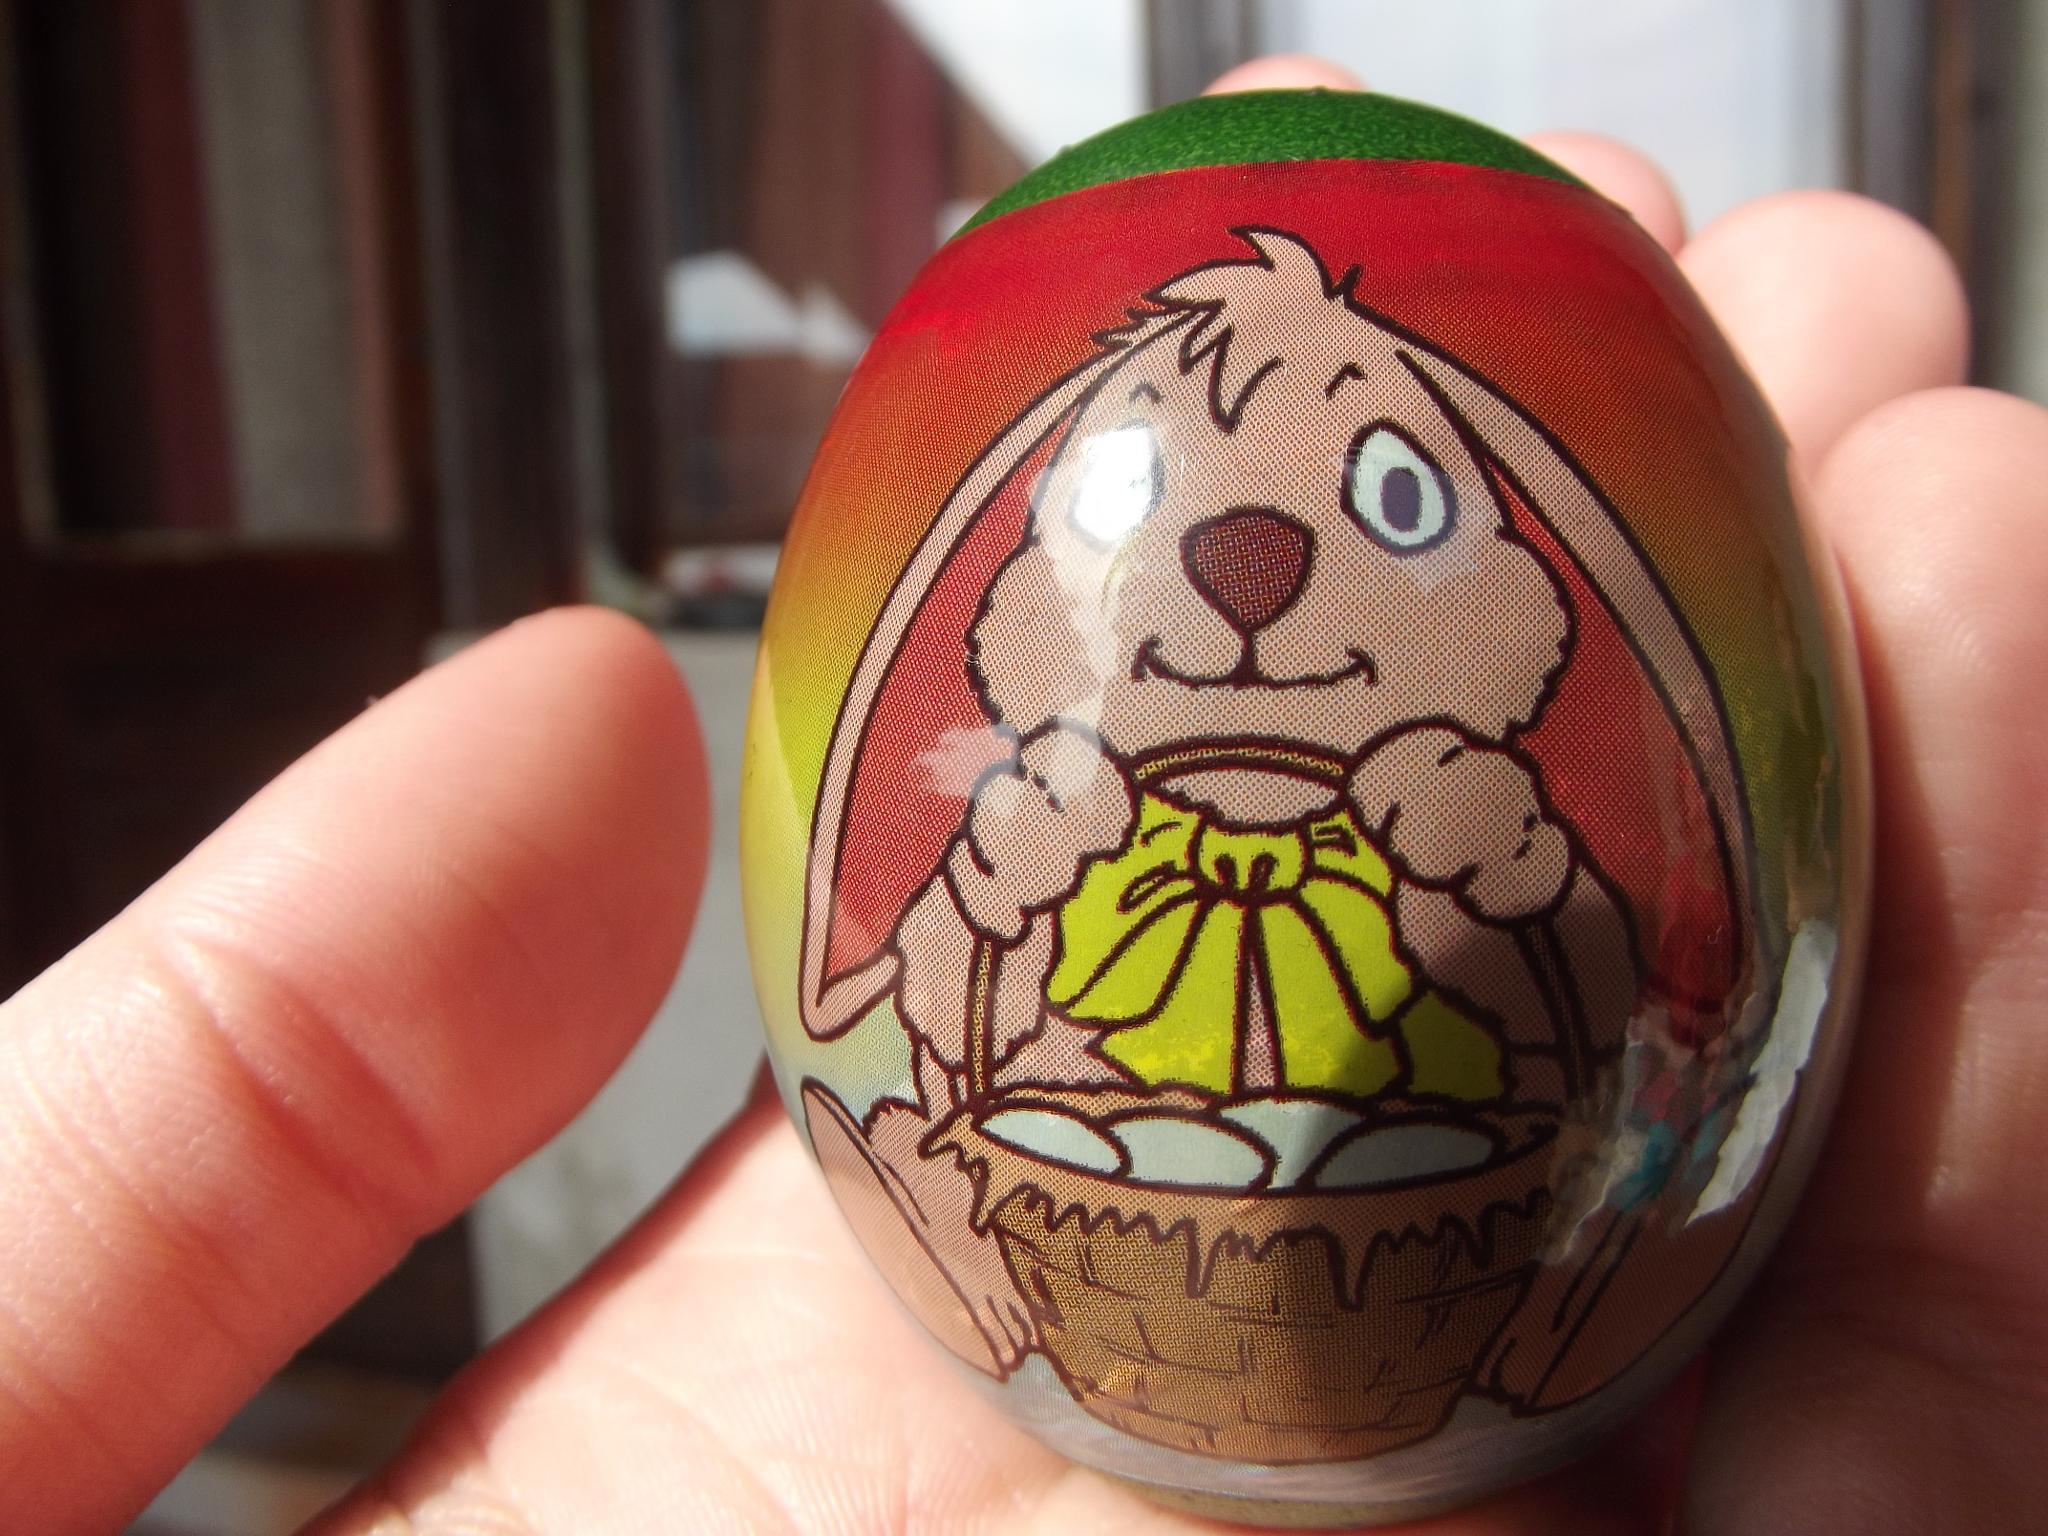 Egg by zizic.snezana